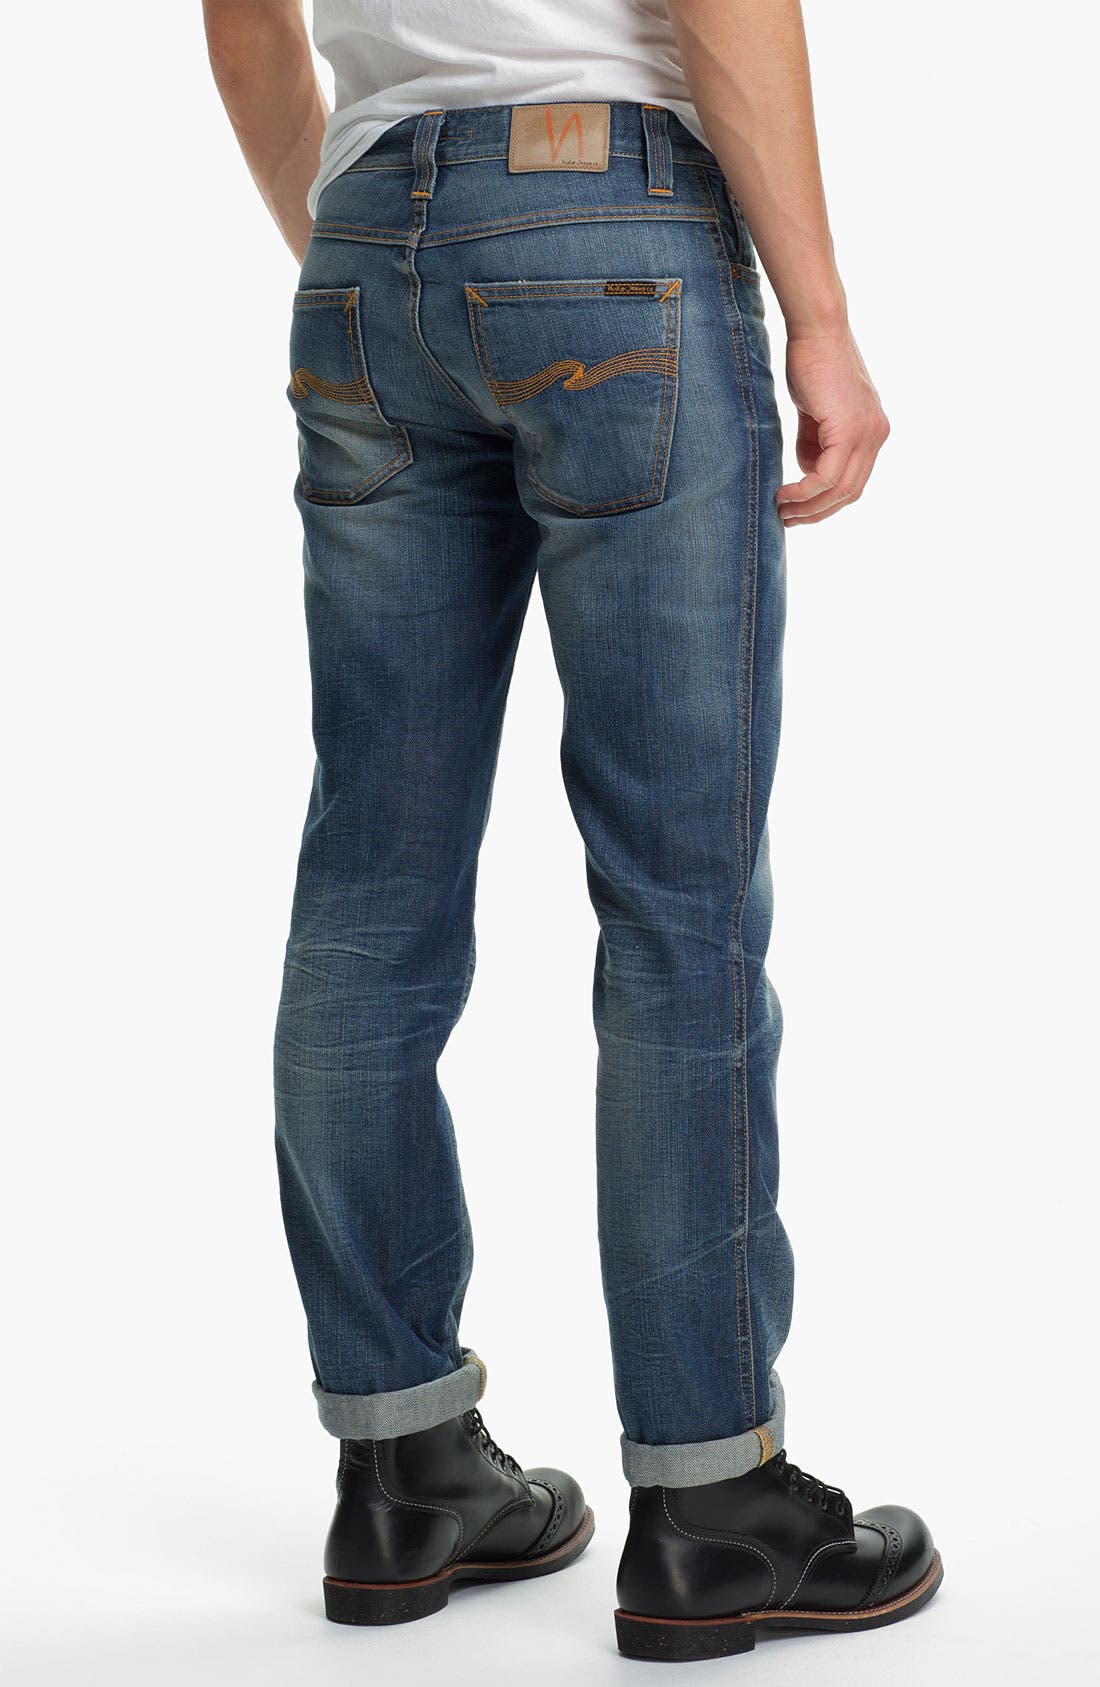 Alternate Image 1 Selected - Nudie 'Slim Jim' Slim Straight Leg Jeans (Organic Broken Dream)